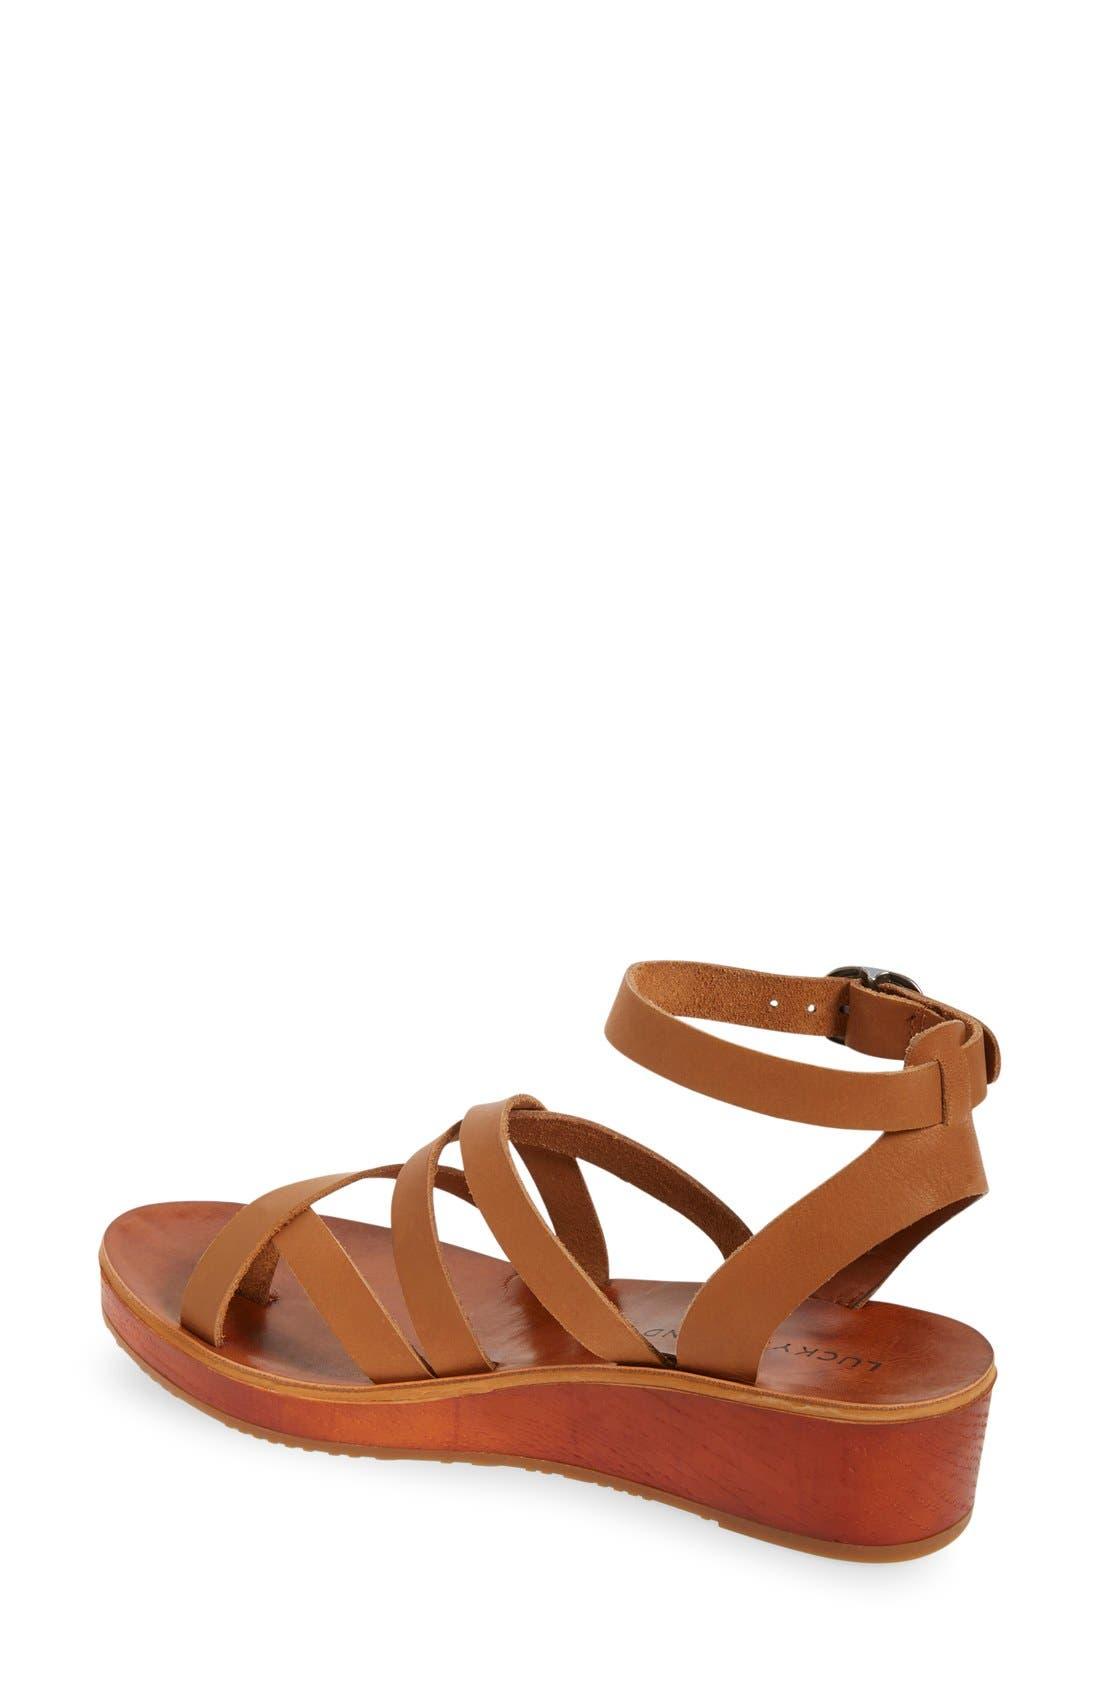 'Honeyy' Platform Sandal,                             Alternate thumbnail 8, color,